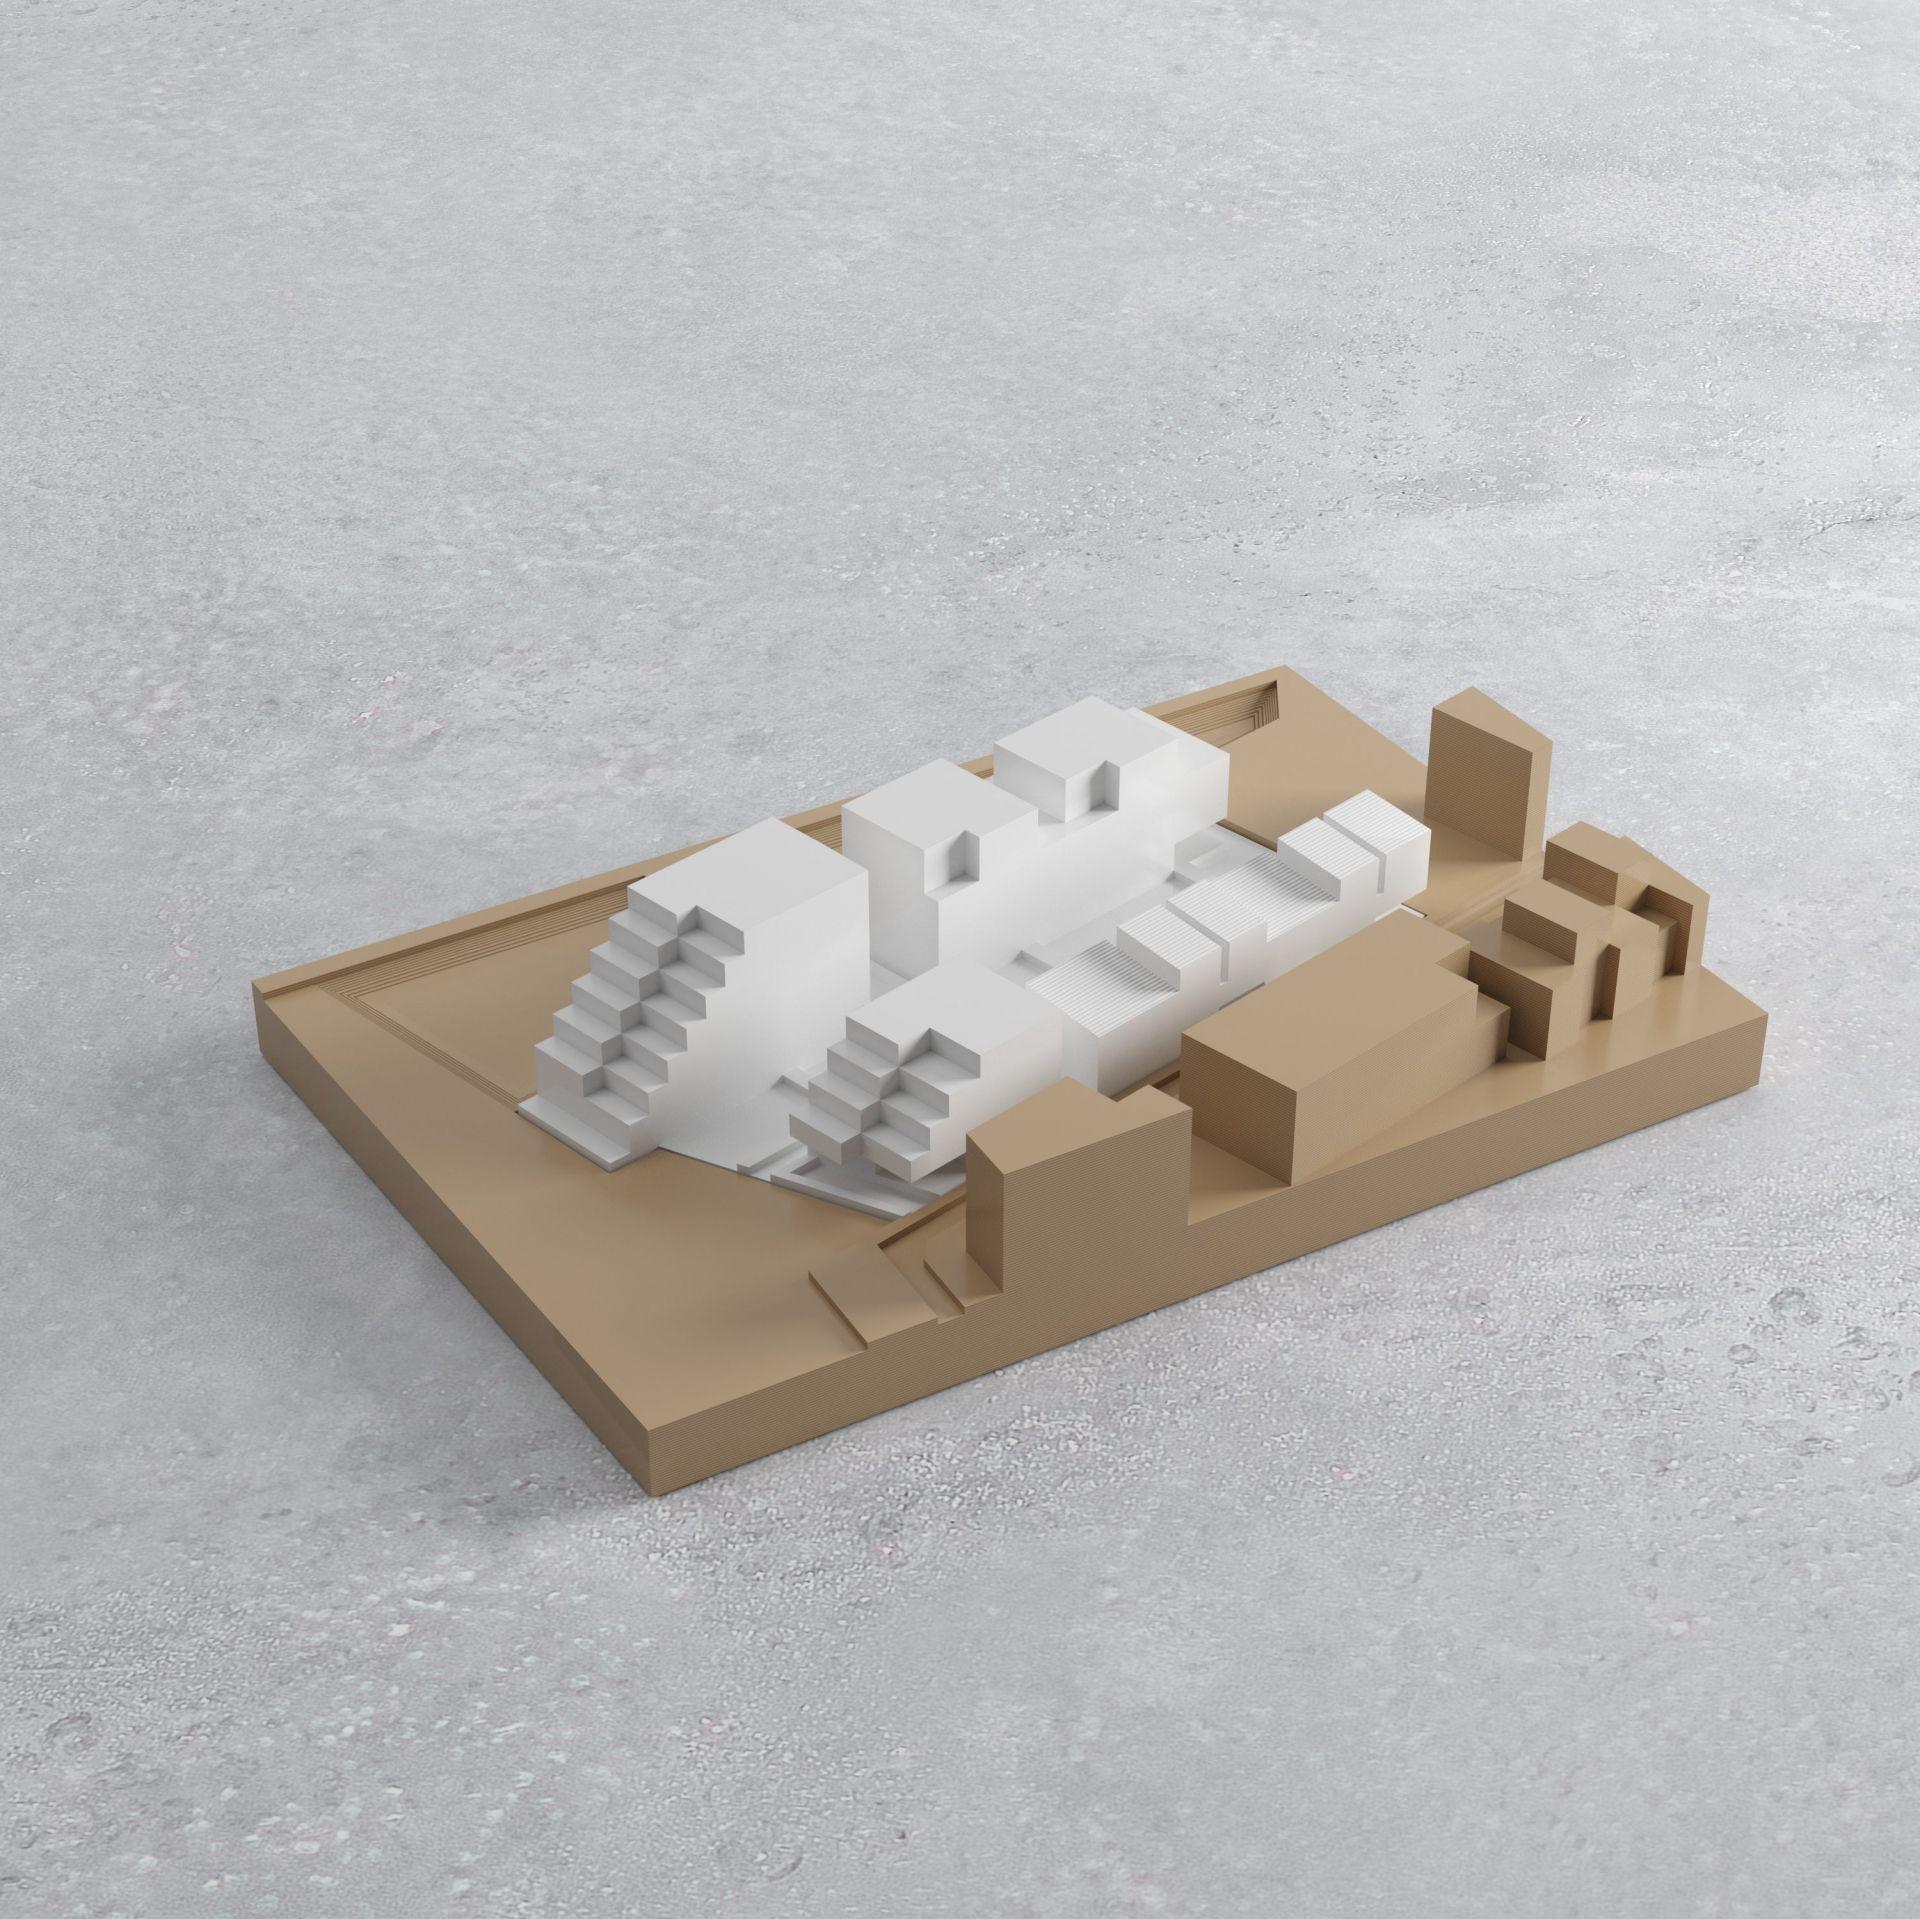 Supervue lgt muz architecture zac des tartres Medium